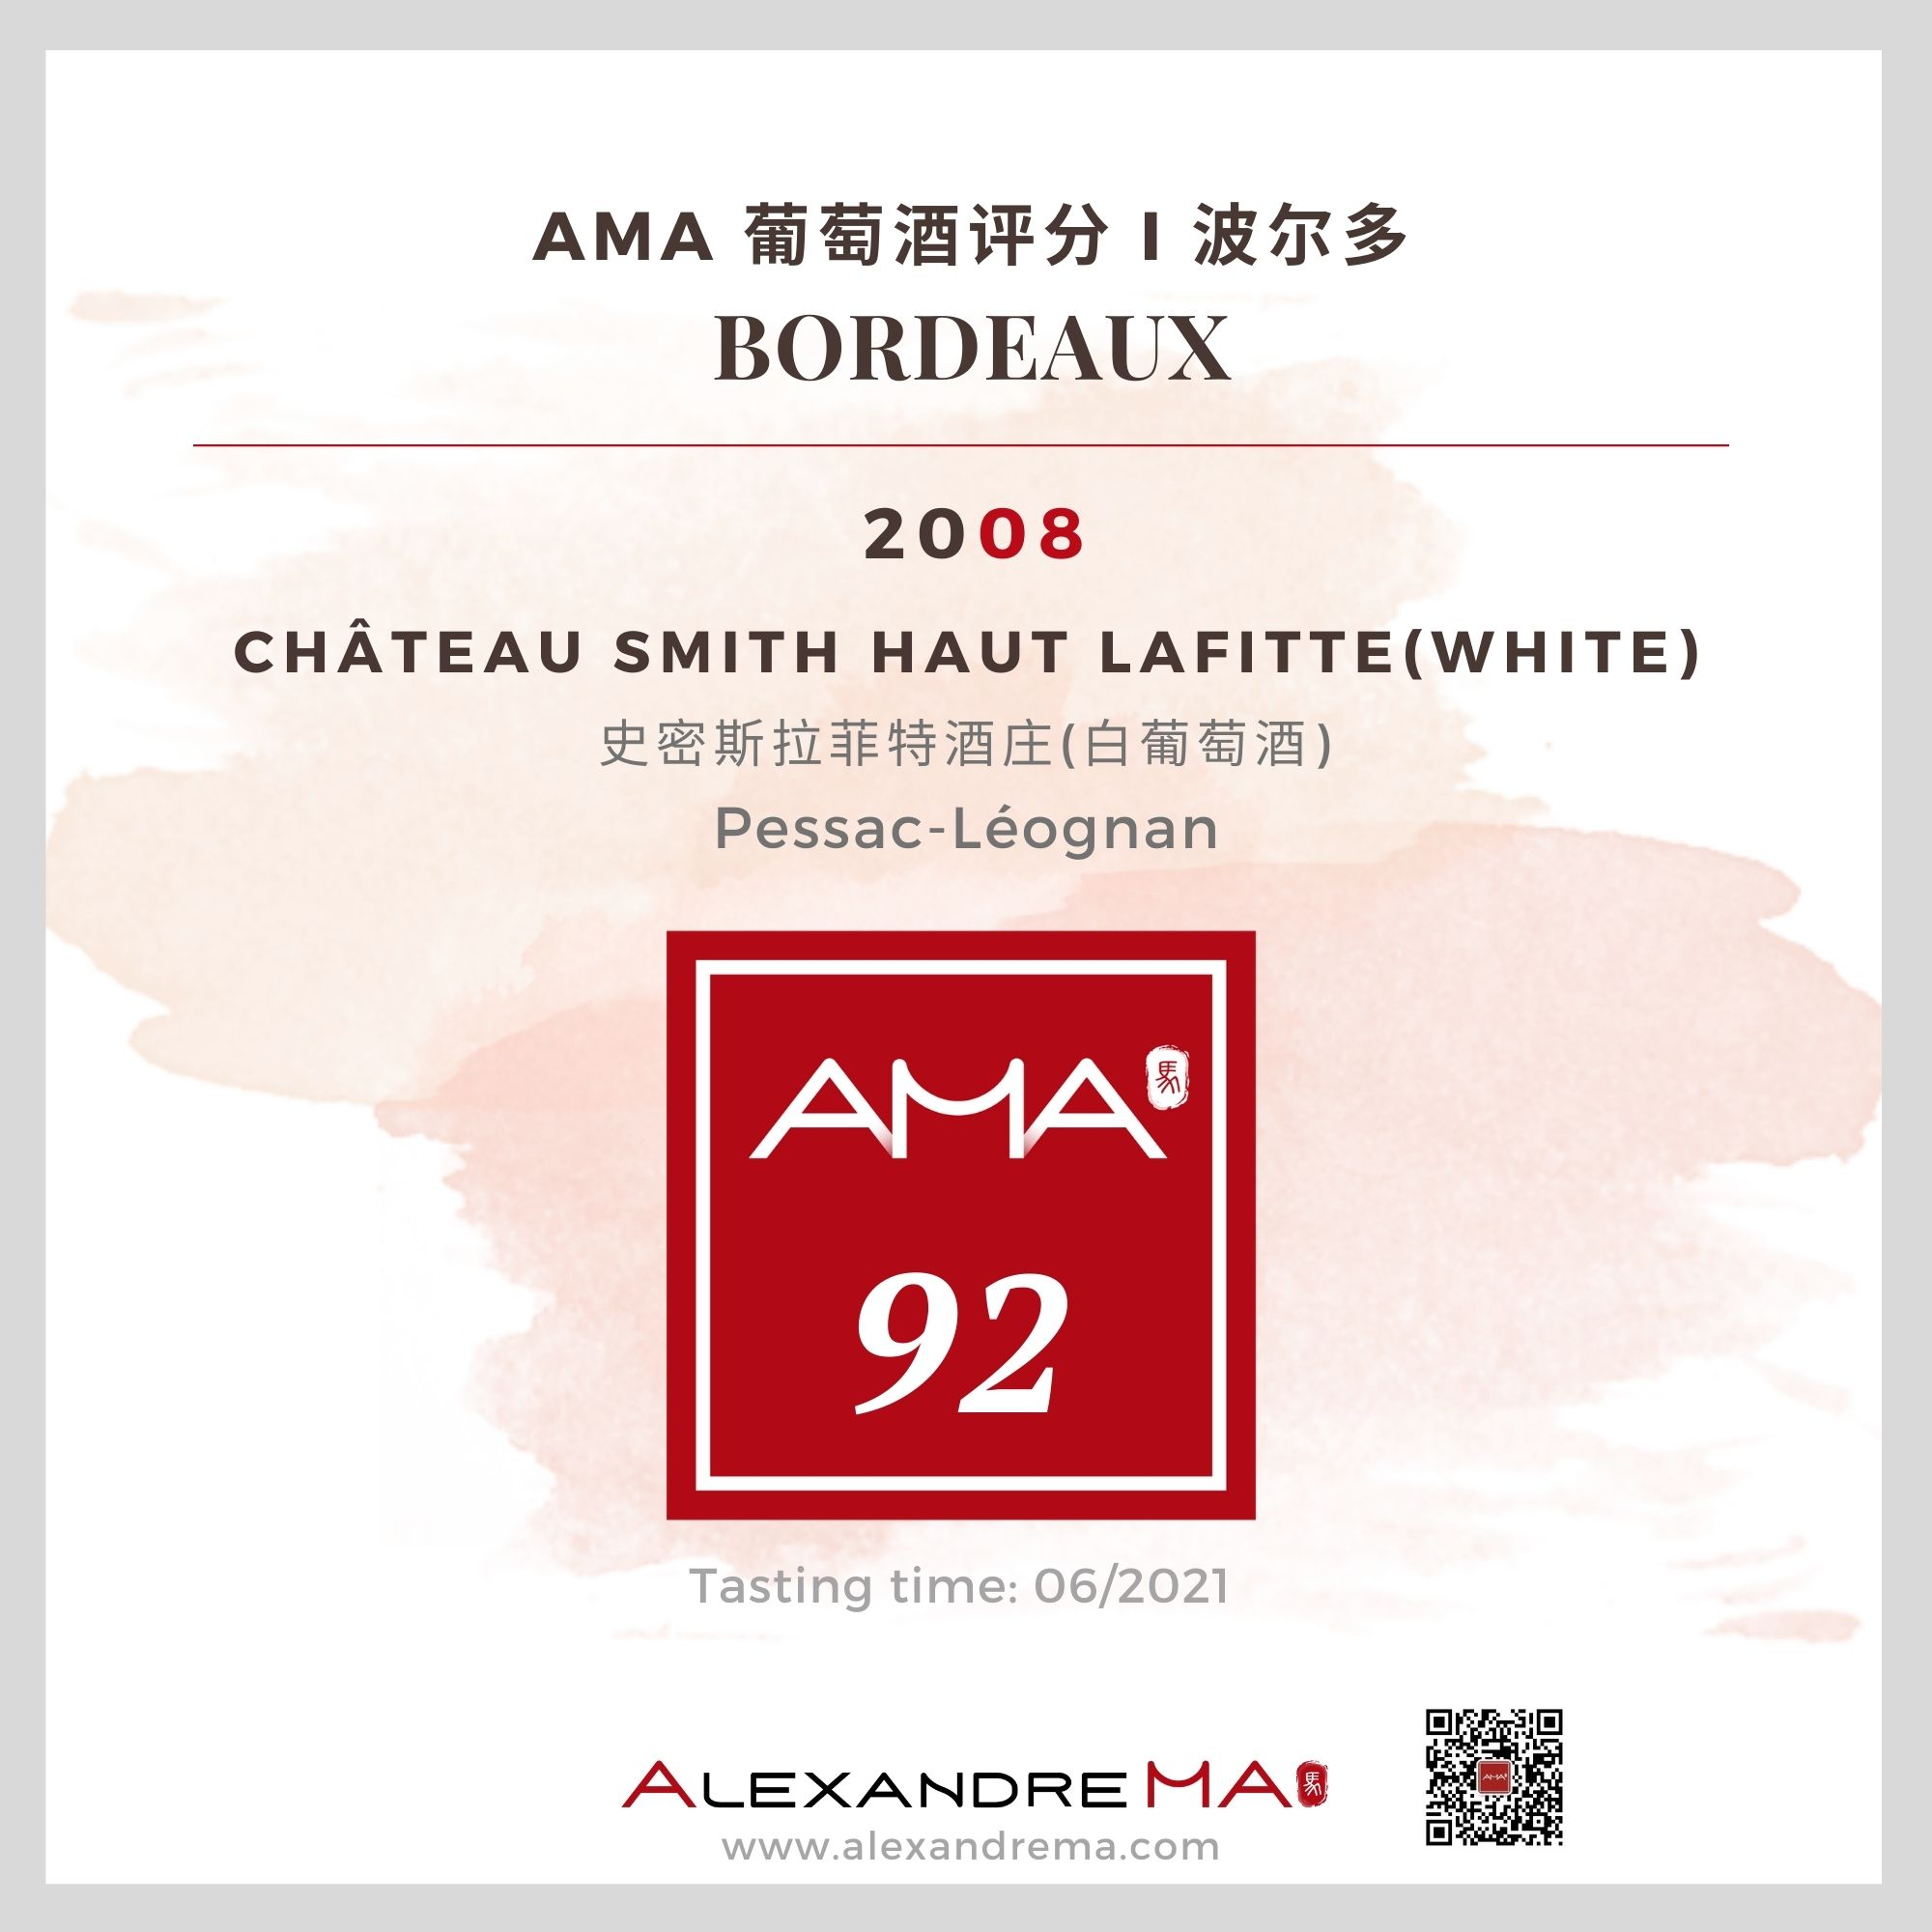 Château Smith Haut Lafitte White 2008 史密斯拉菲特酒庄 - Alexandre Ma